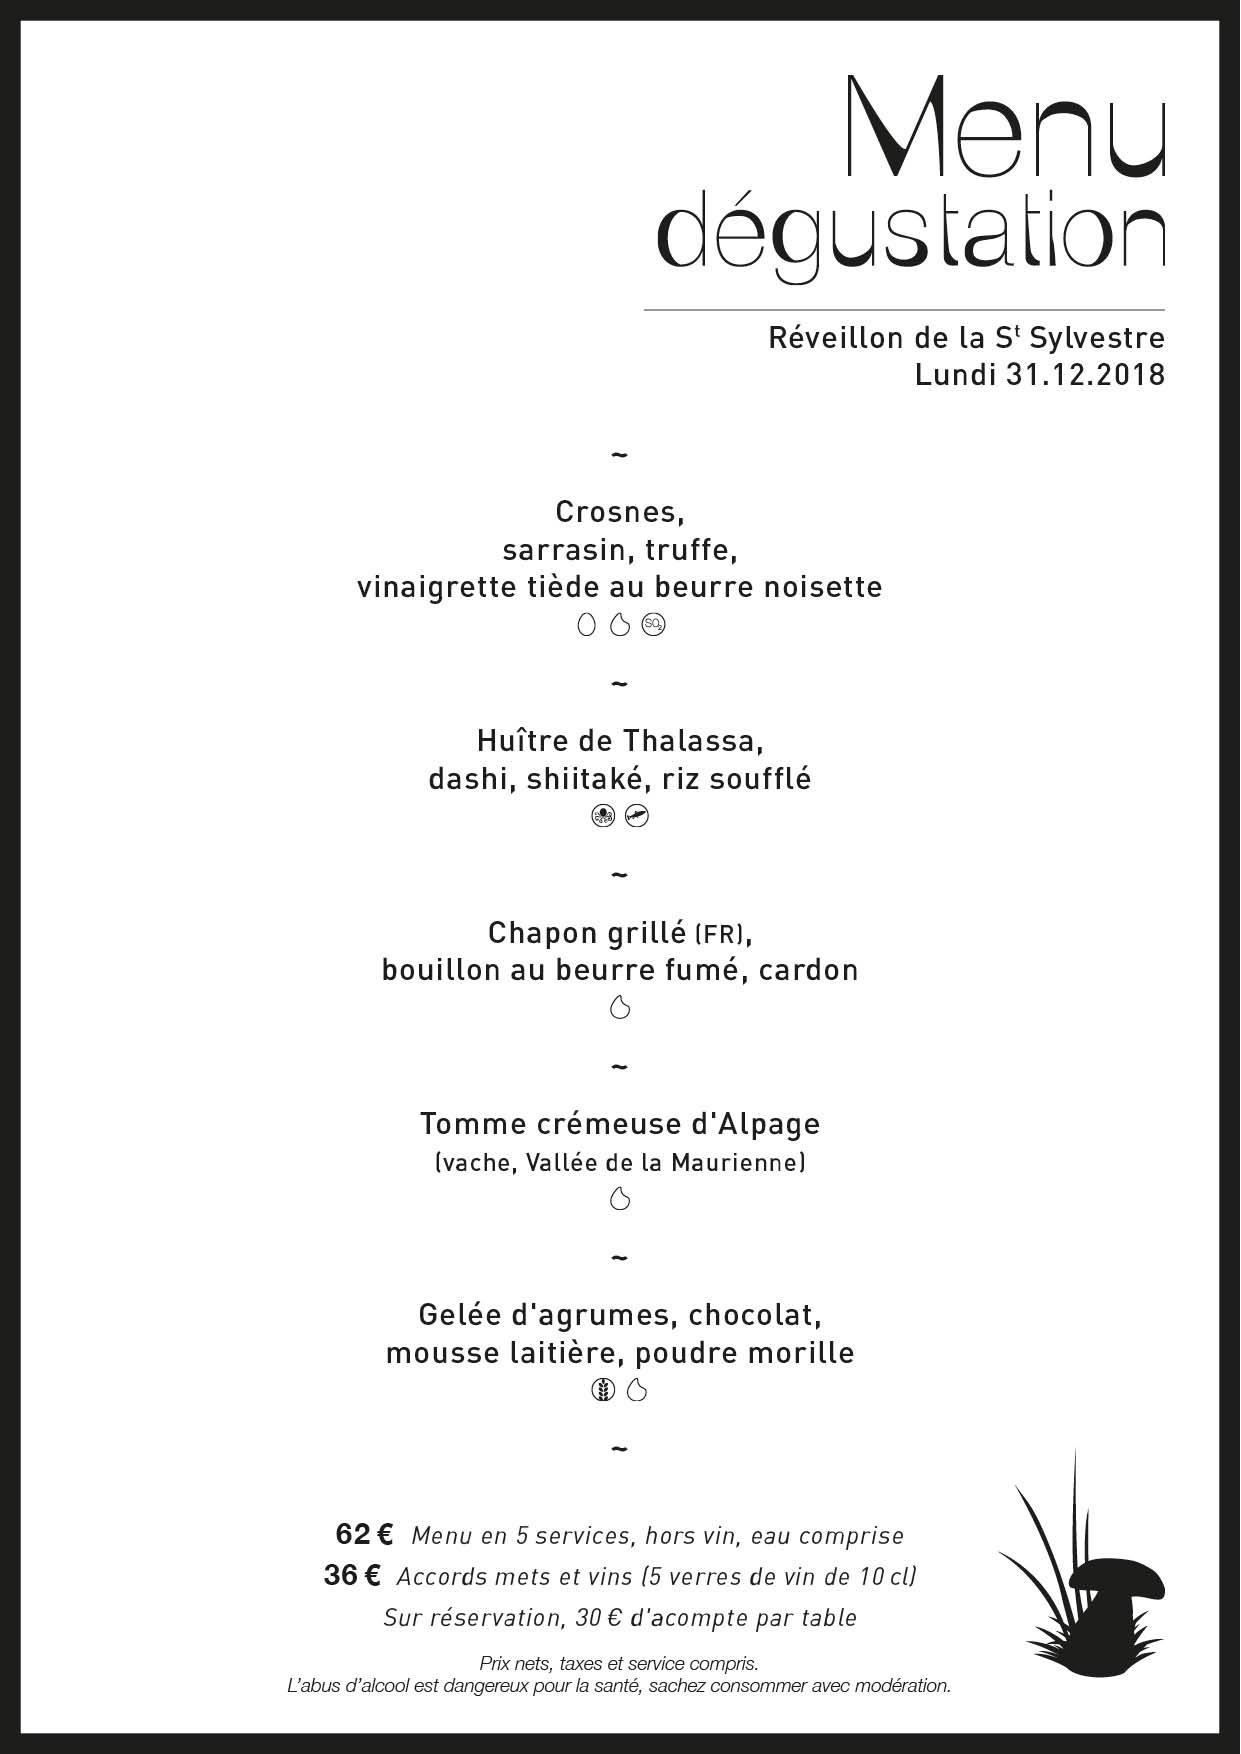 Carte Accord Met Et Vin.Actualites Substrat Restaurant